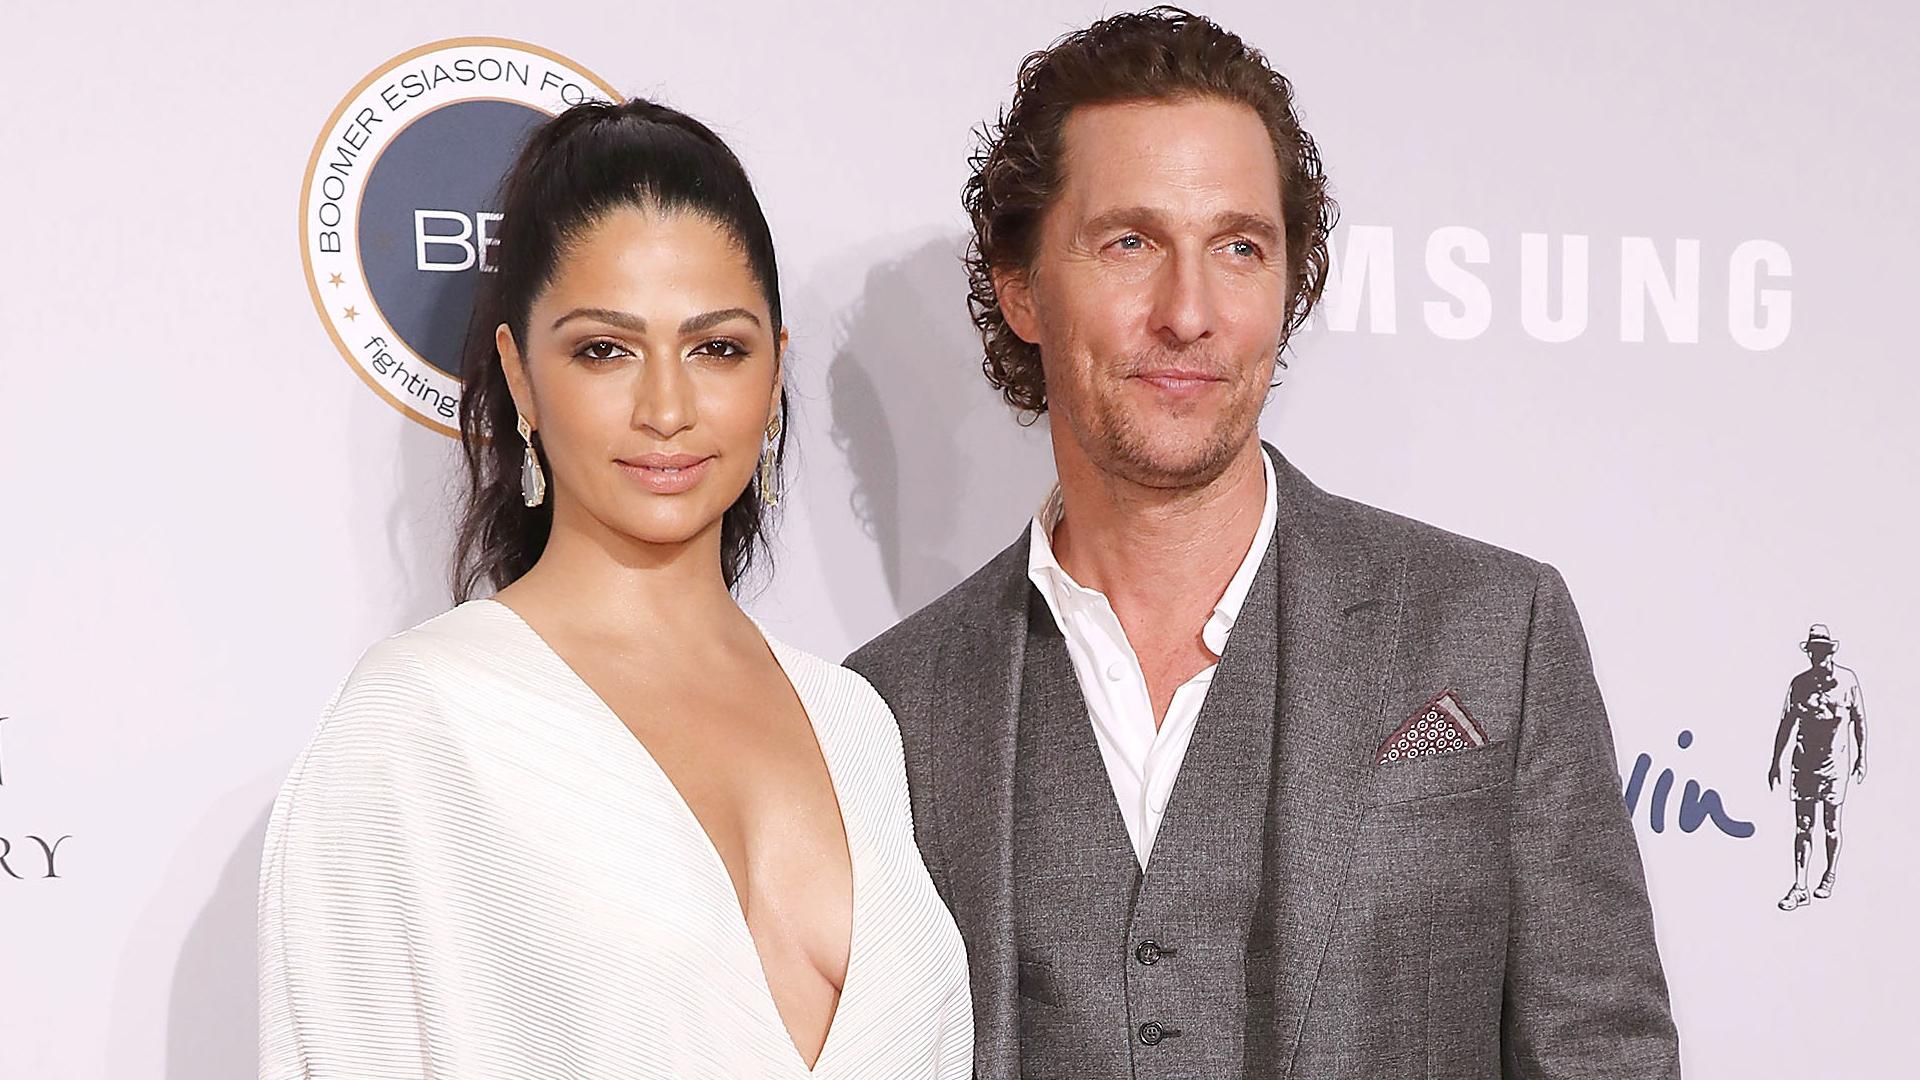 See Camila McConaughey's Inspiring Family Throwback Photo